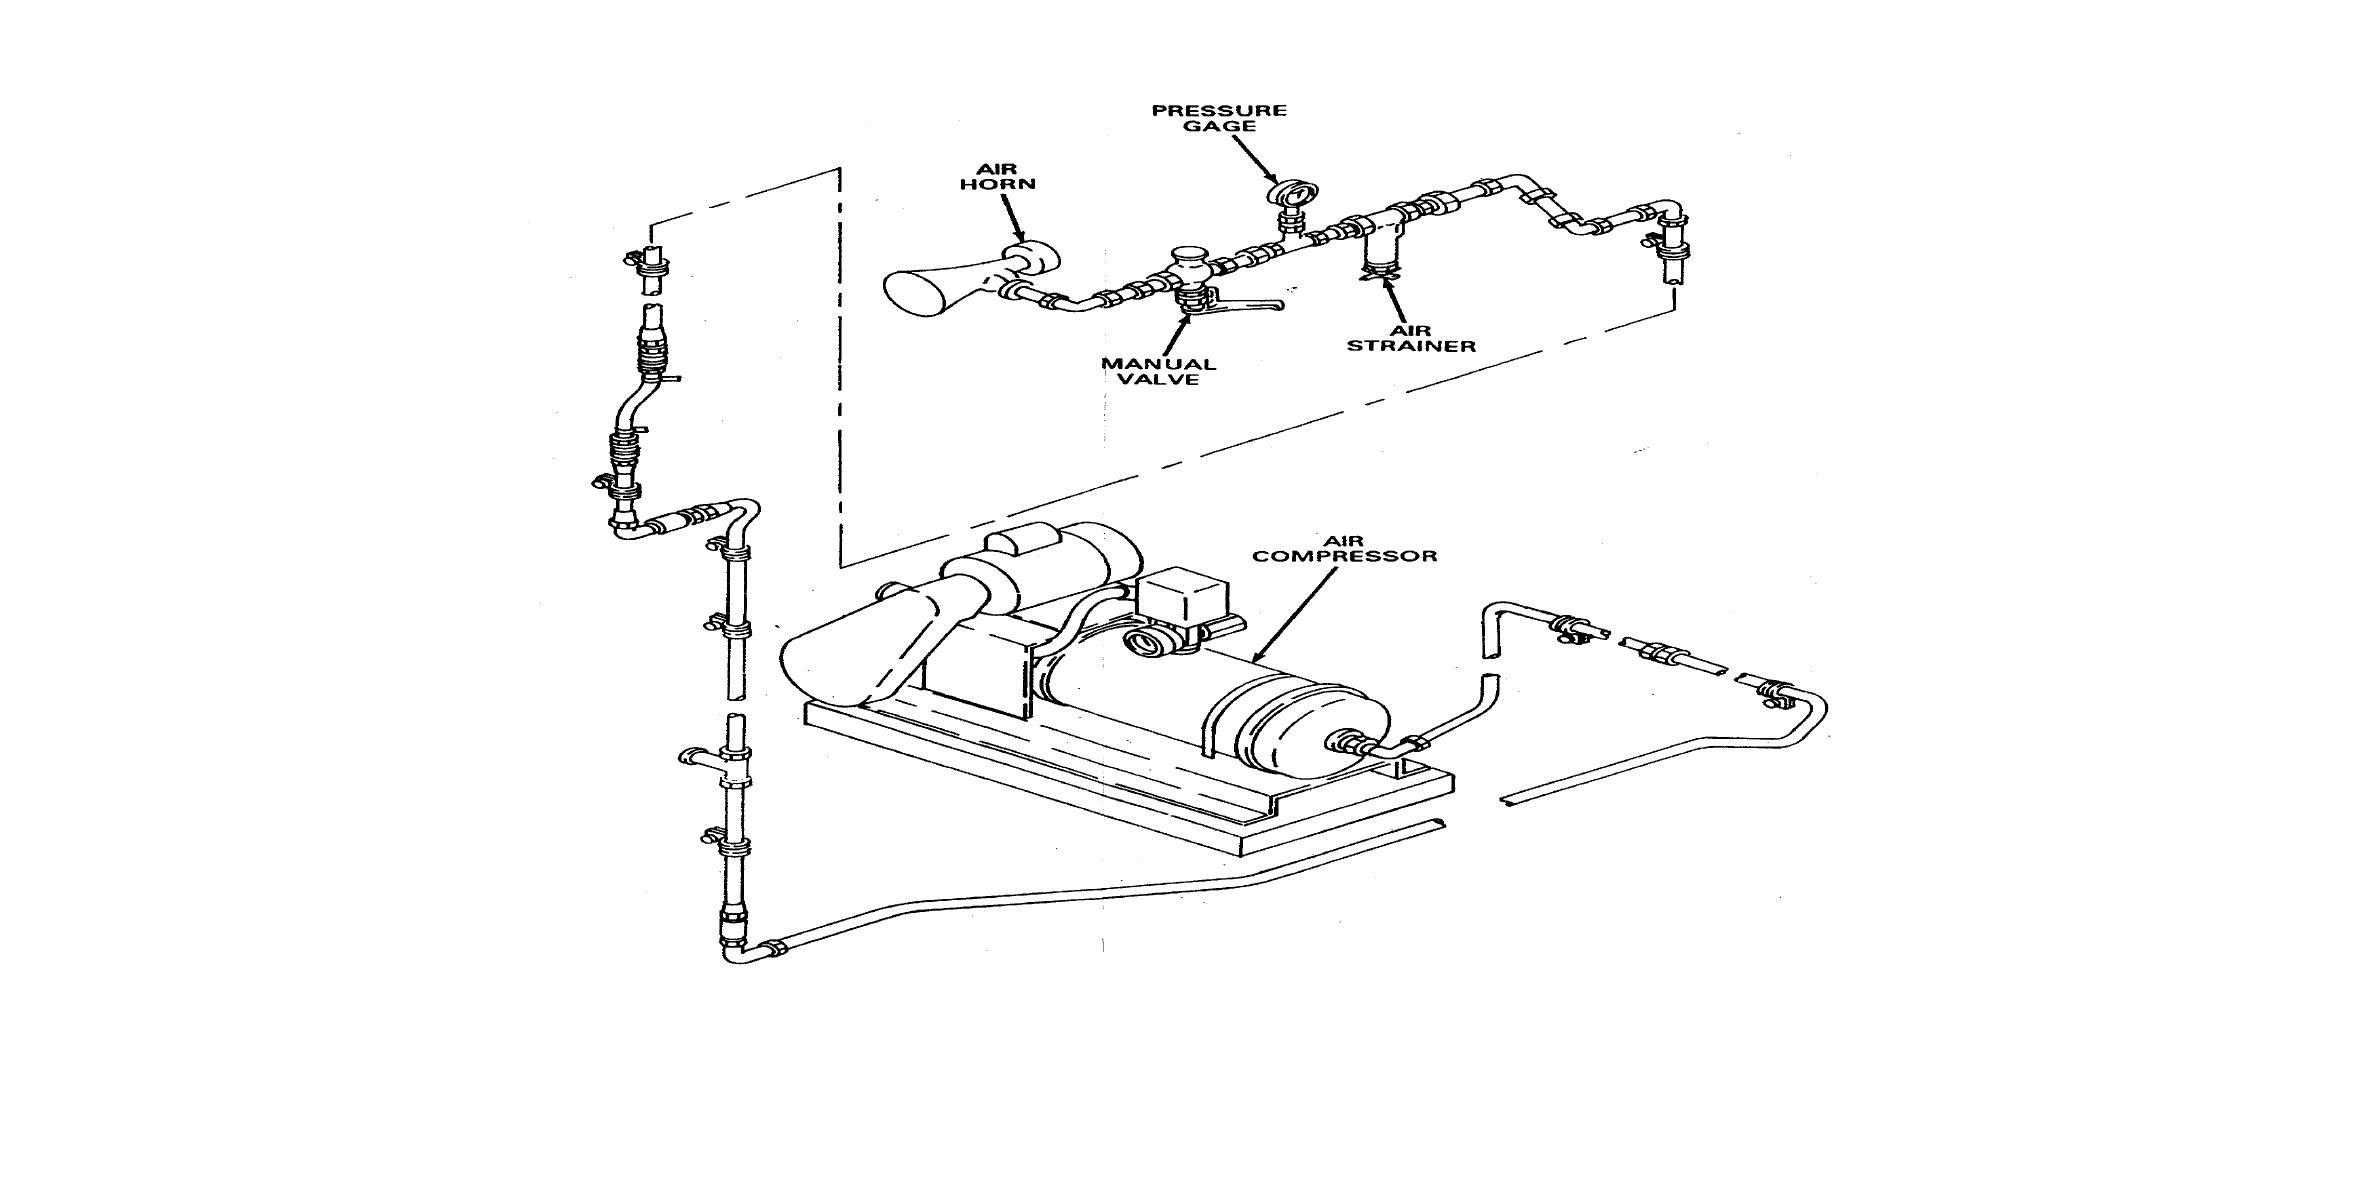 FO-7. Air Horn, Air Compressor System